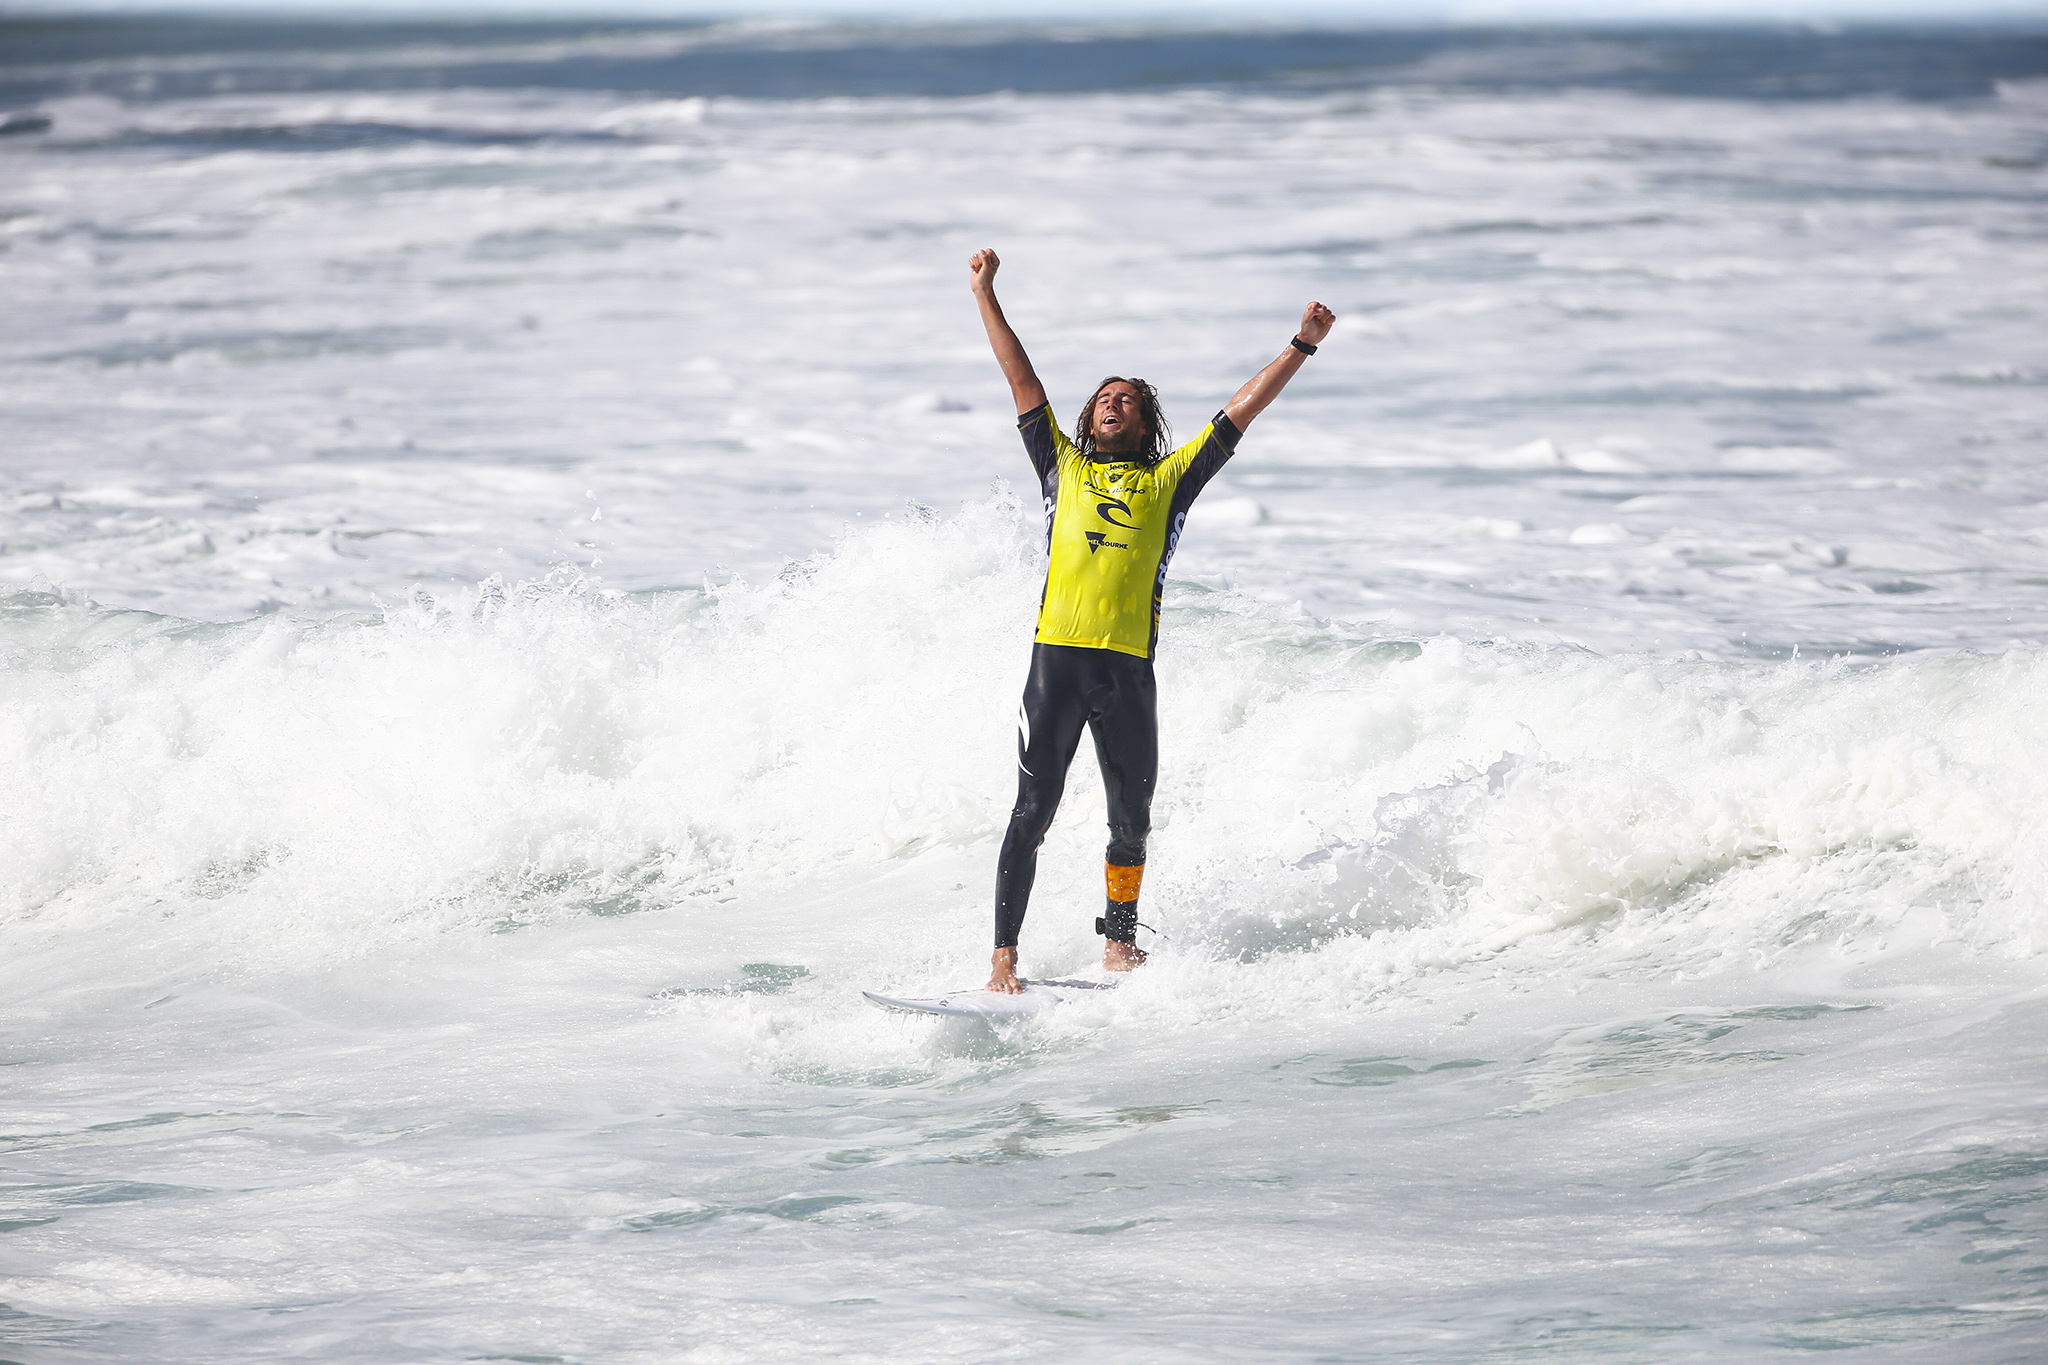 Matt Wilkinson of Australia celebrates his victory at the Rip Curl Pro Bells Beach.